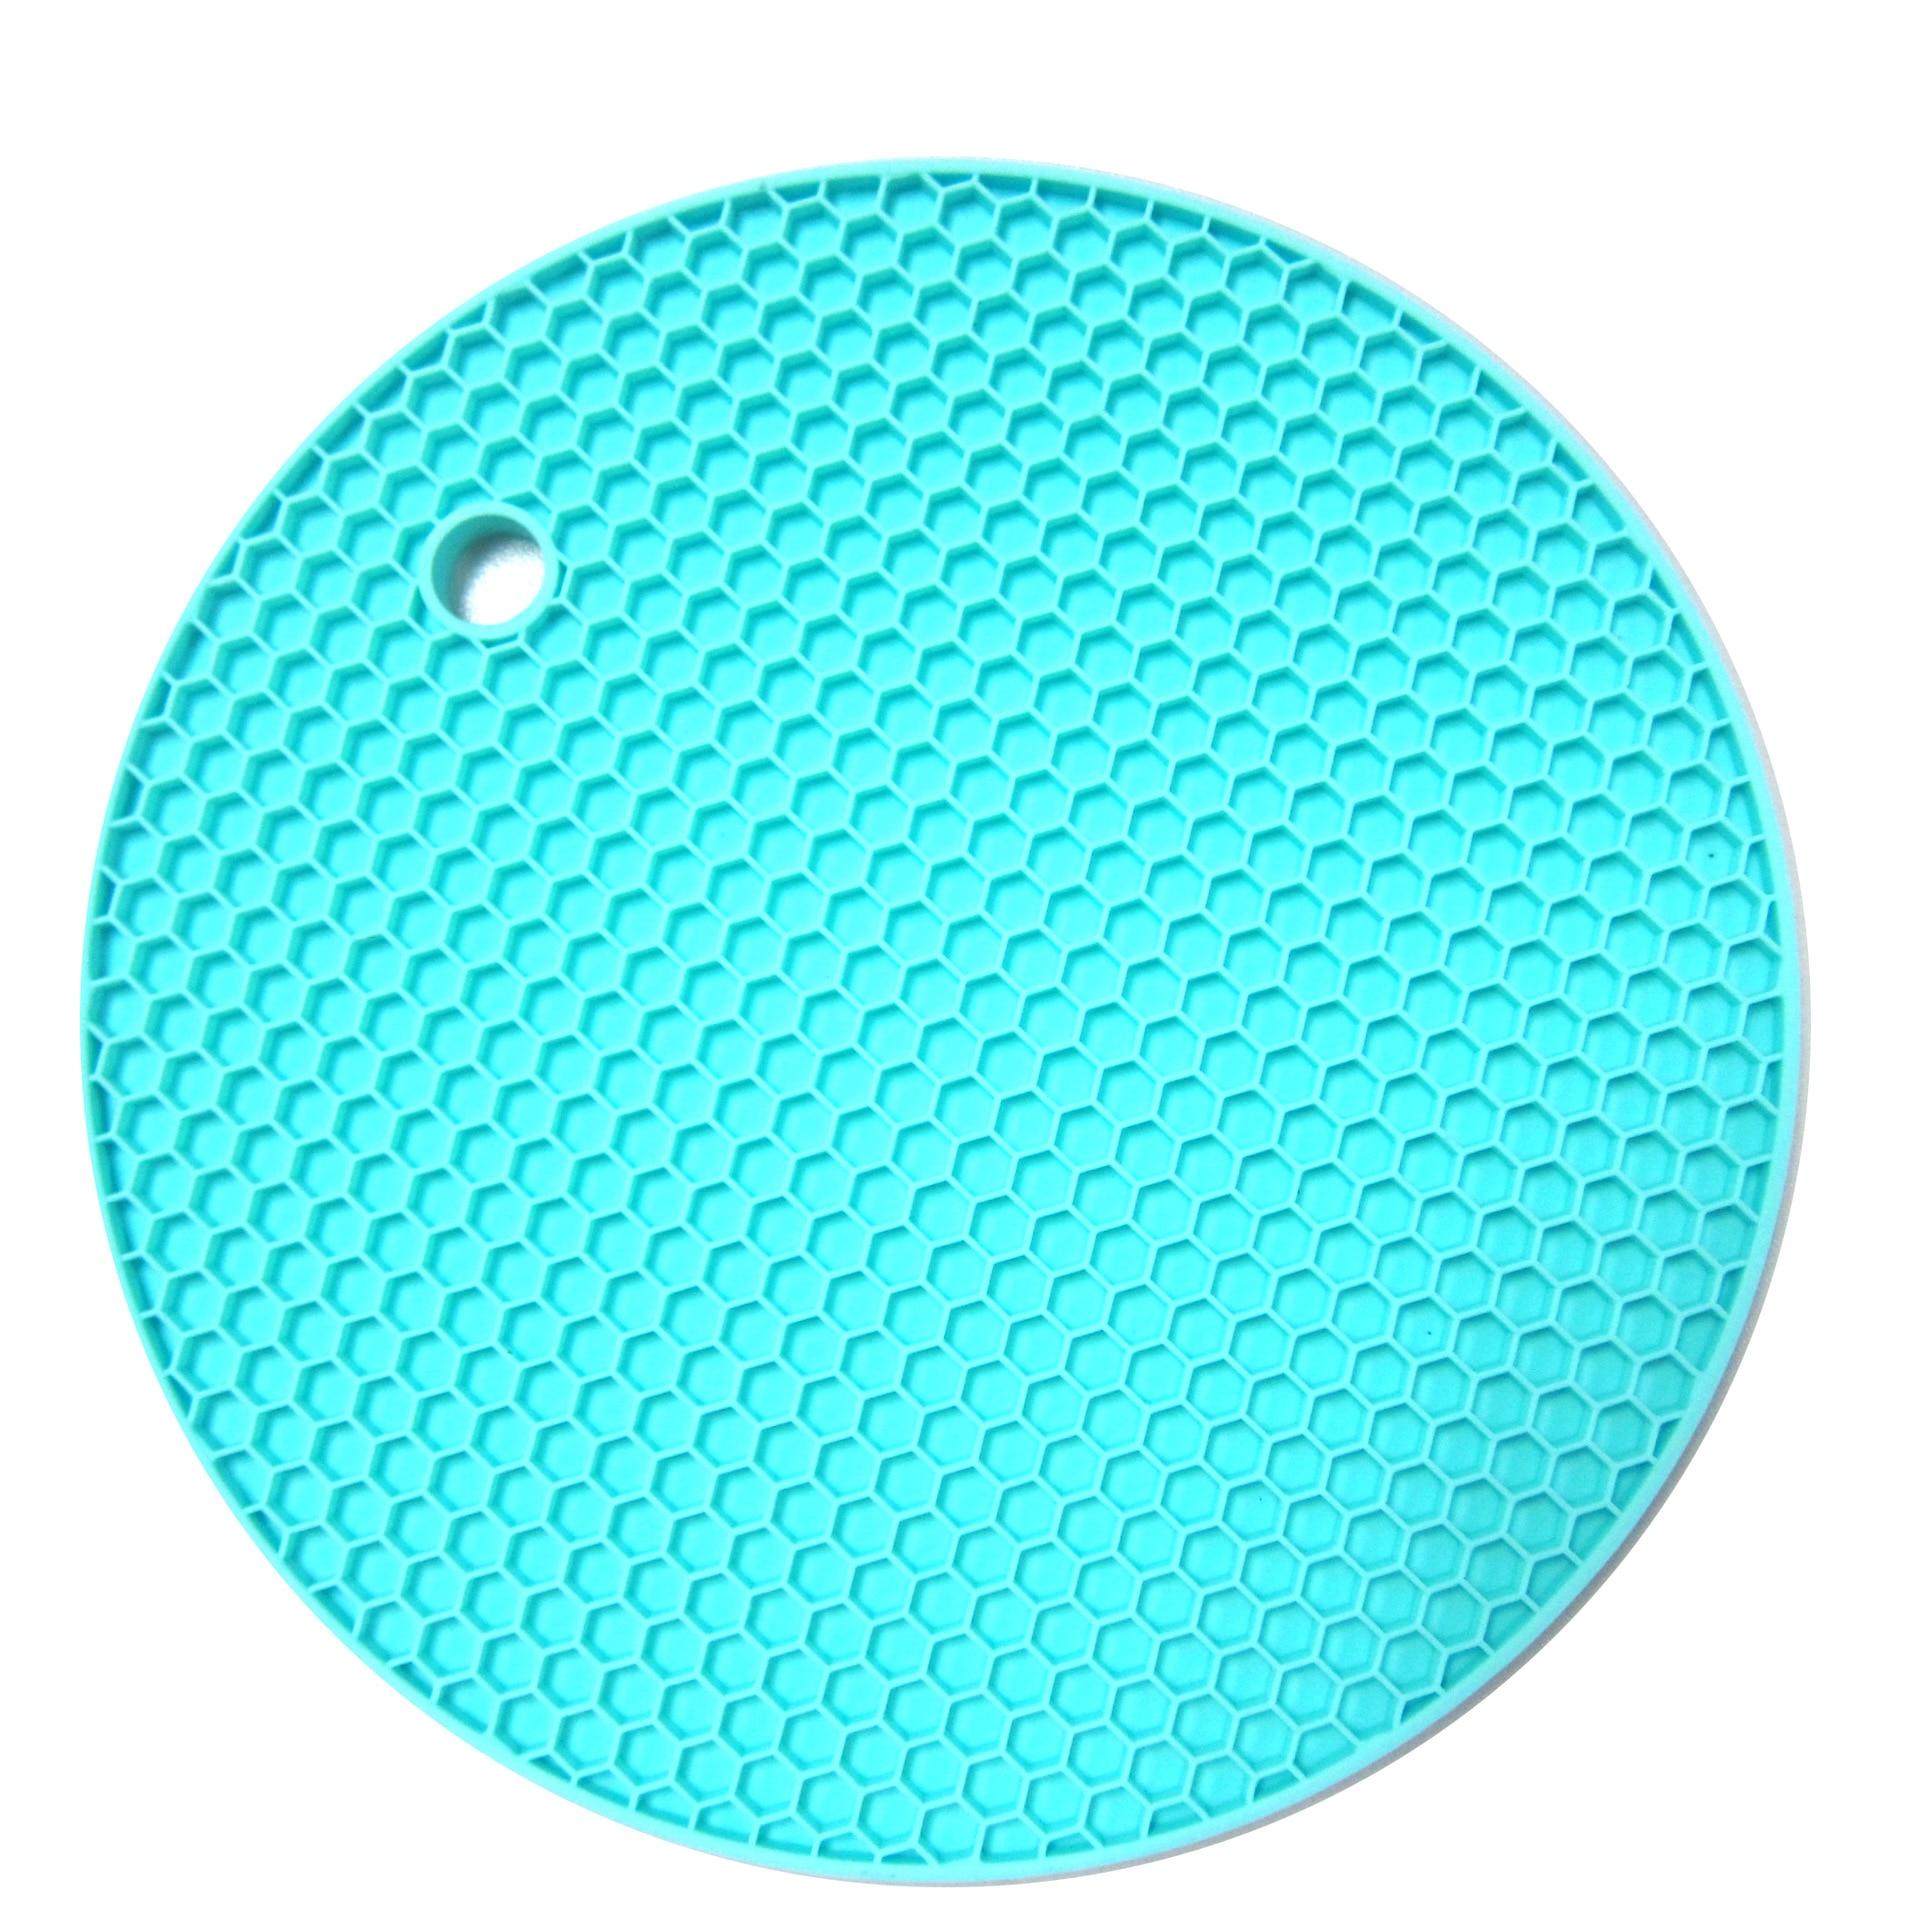 mat pack multi heat round silicone kitchen mats pot holder purpose resistant itm trivet